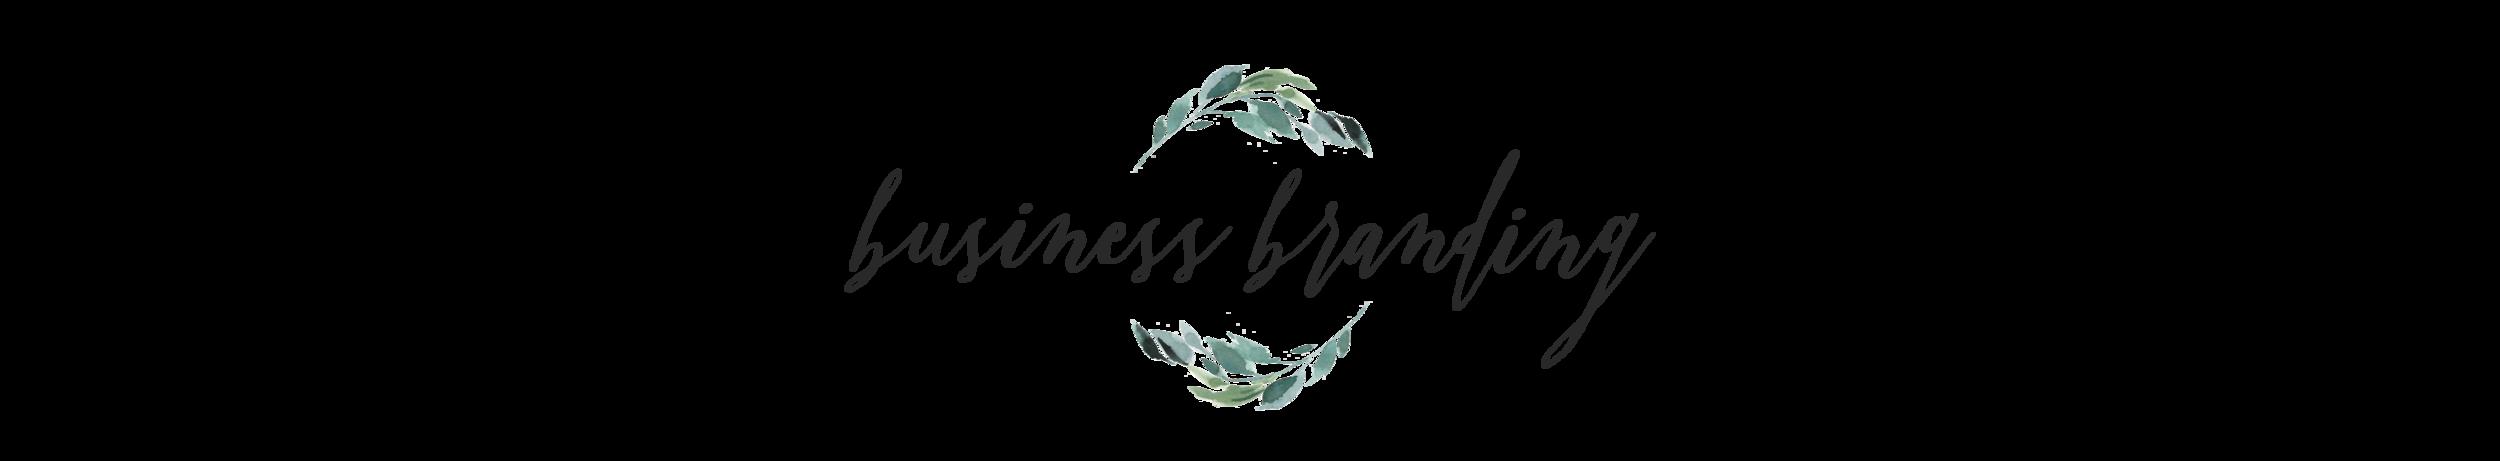 business branding.png